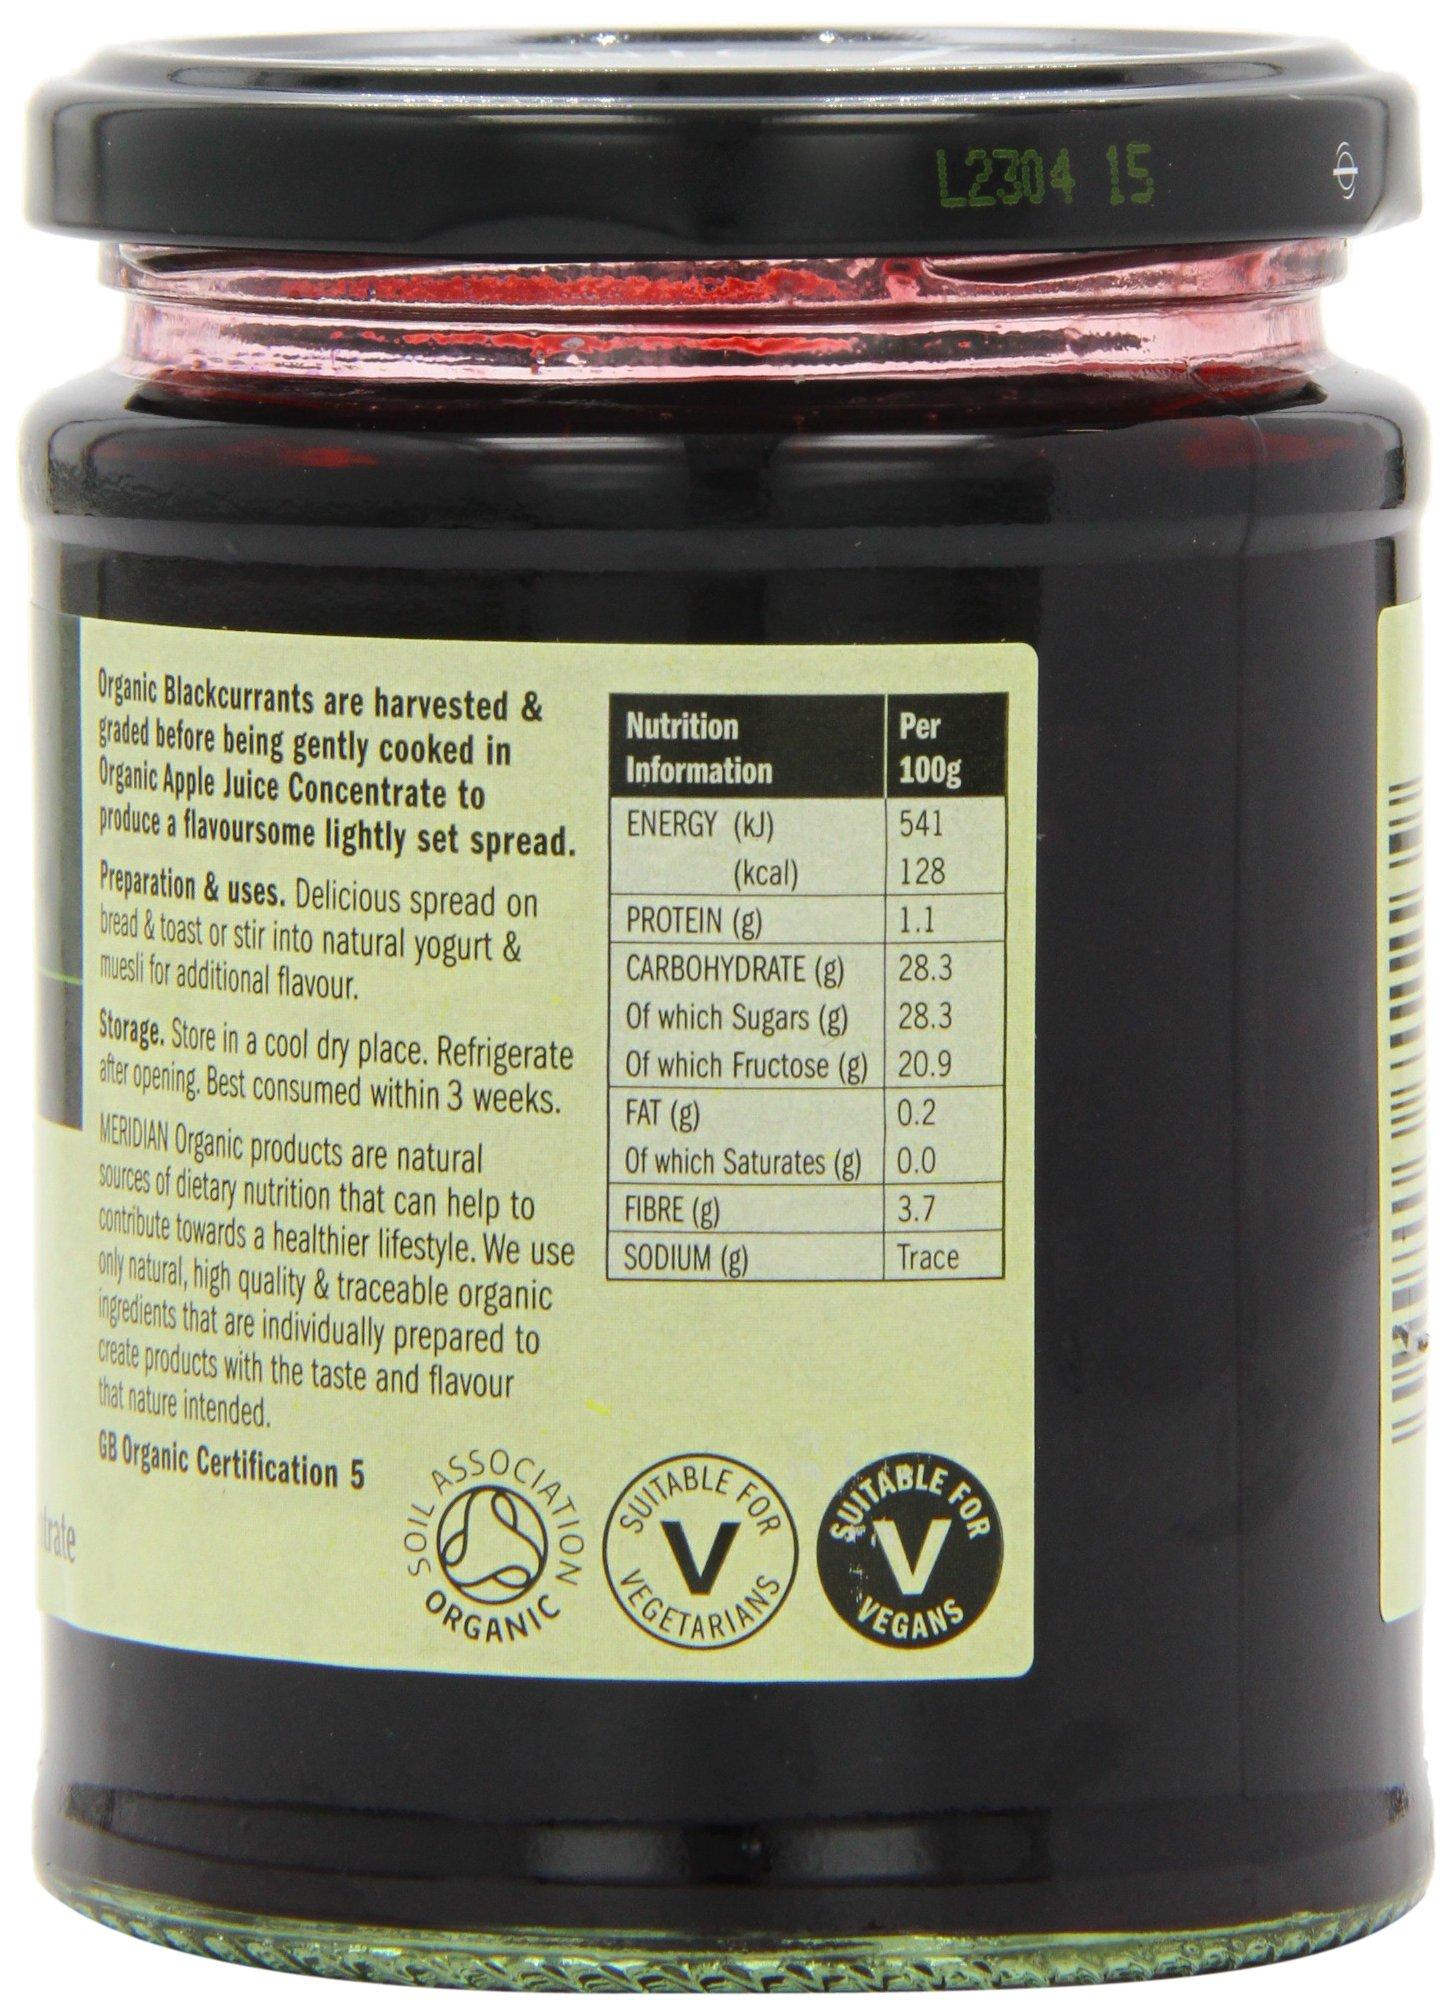 Meridian Organic Blackcurrant Fruit Spread 284 g (Pack of 6) by Meridian (Image #2)